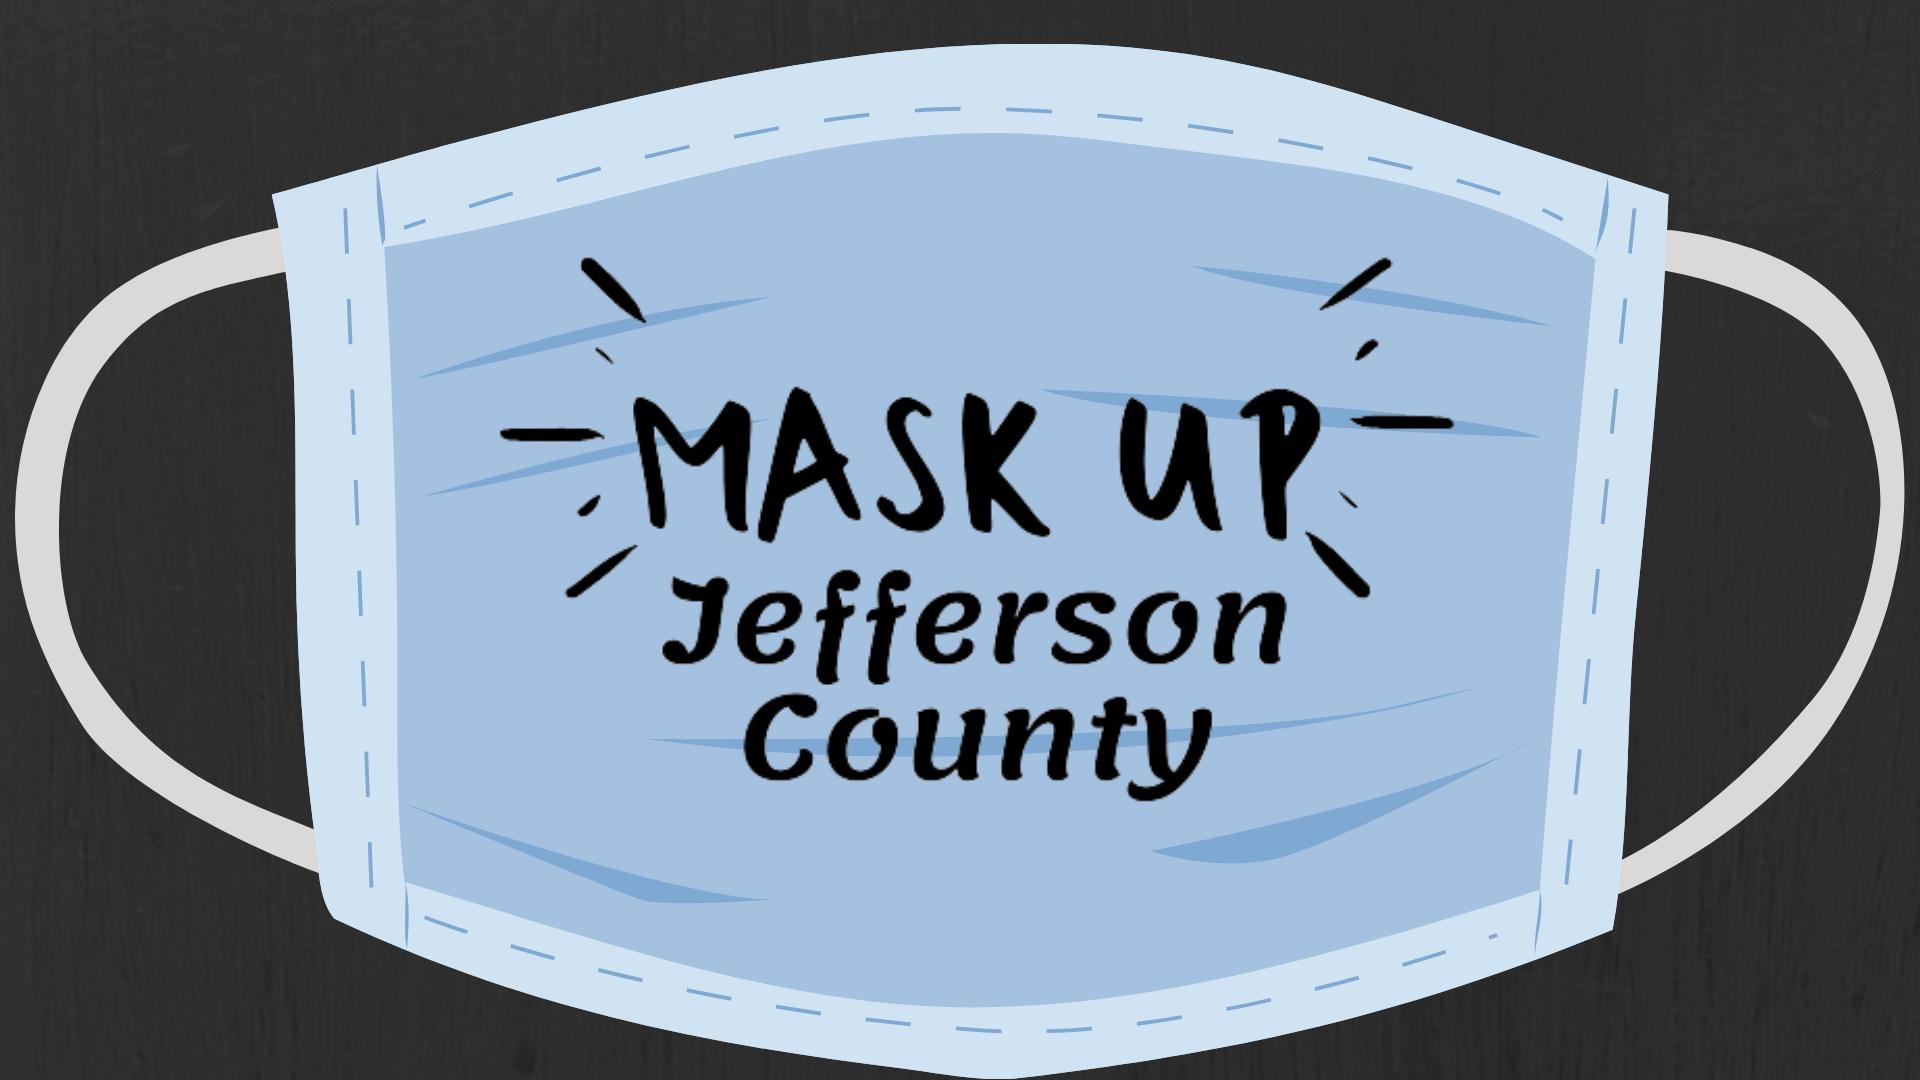 Mask Up Jefferson County!